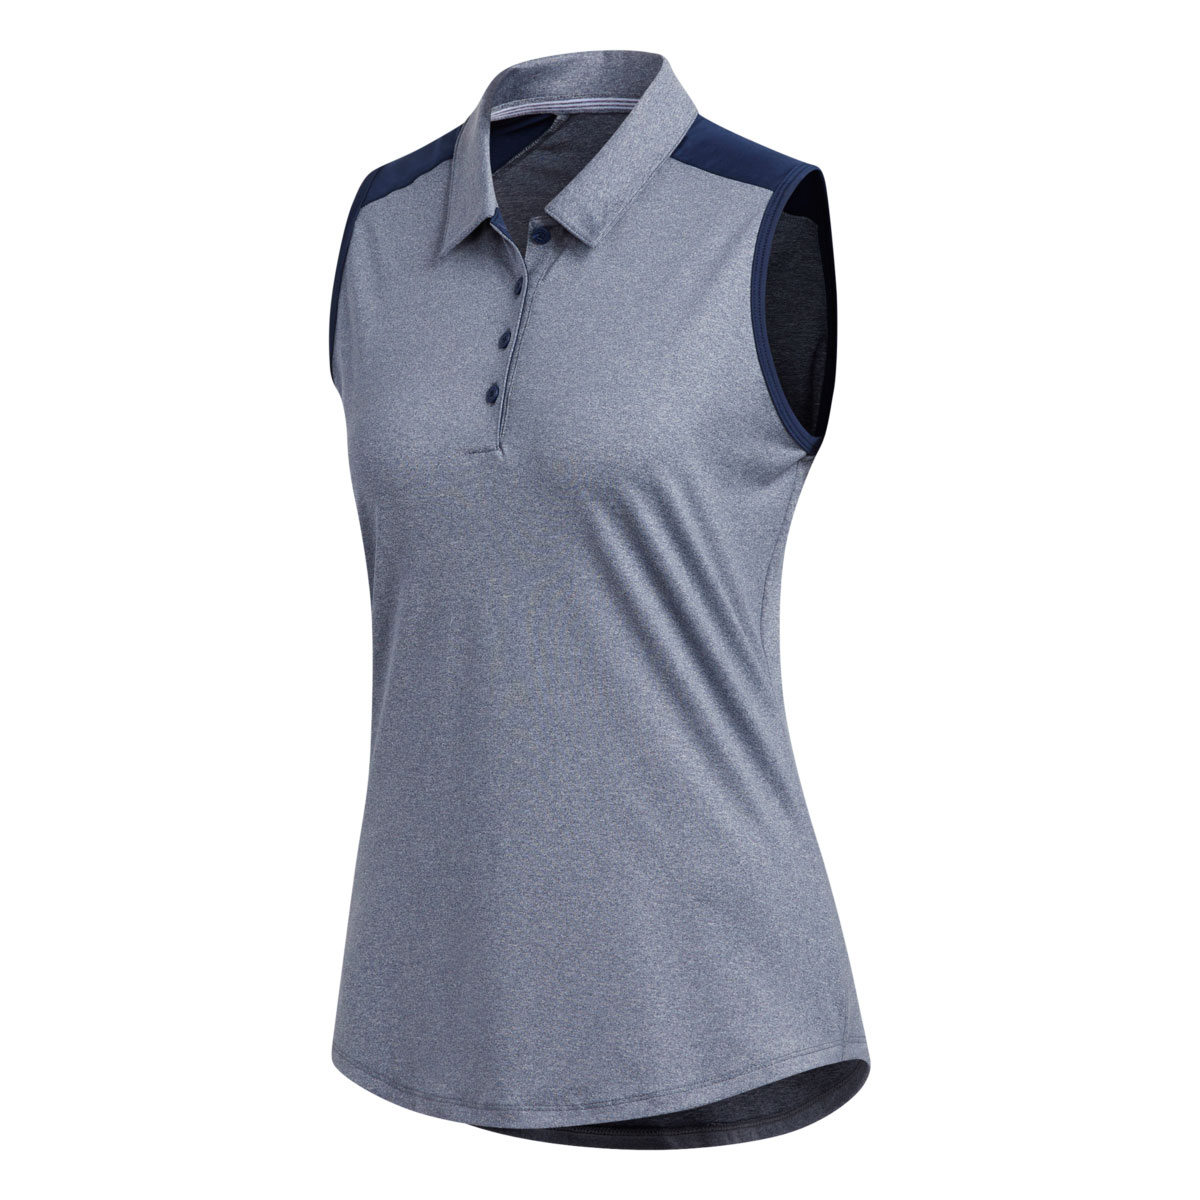 Adidas Women's Ultimate Heathered Sleeveless Night Indigo Polo